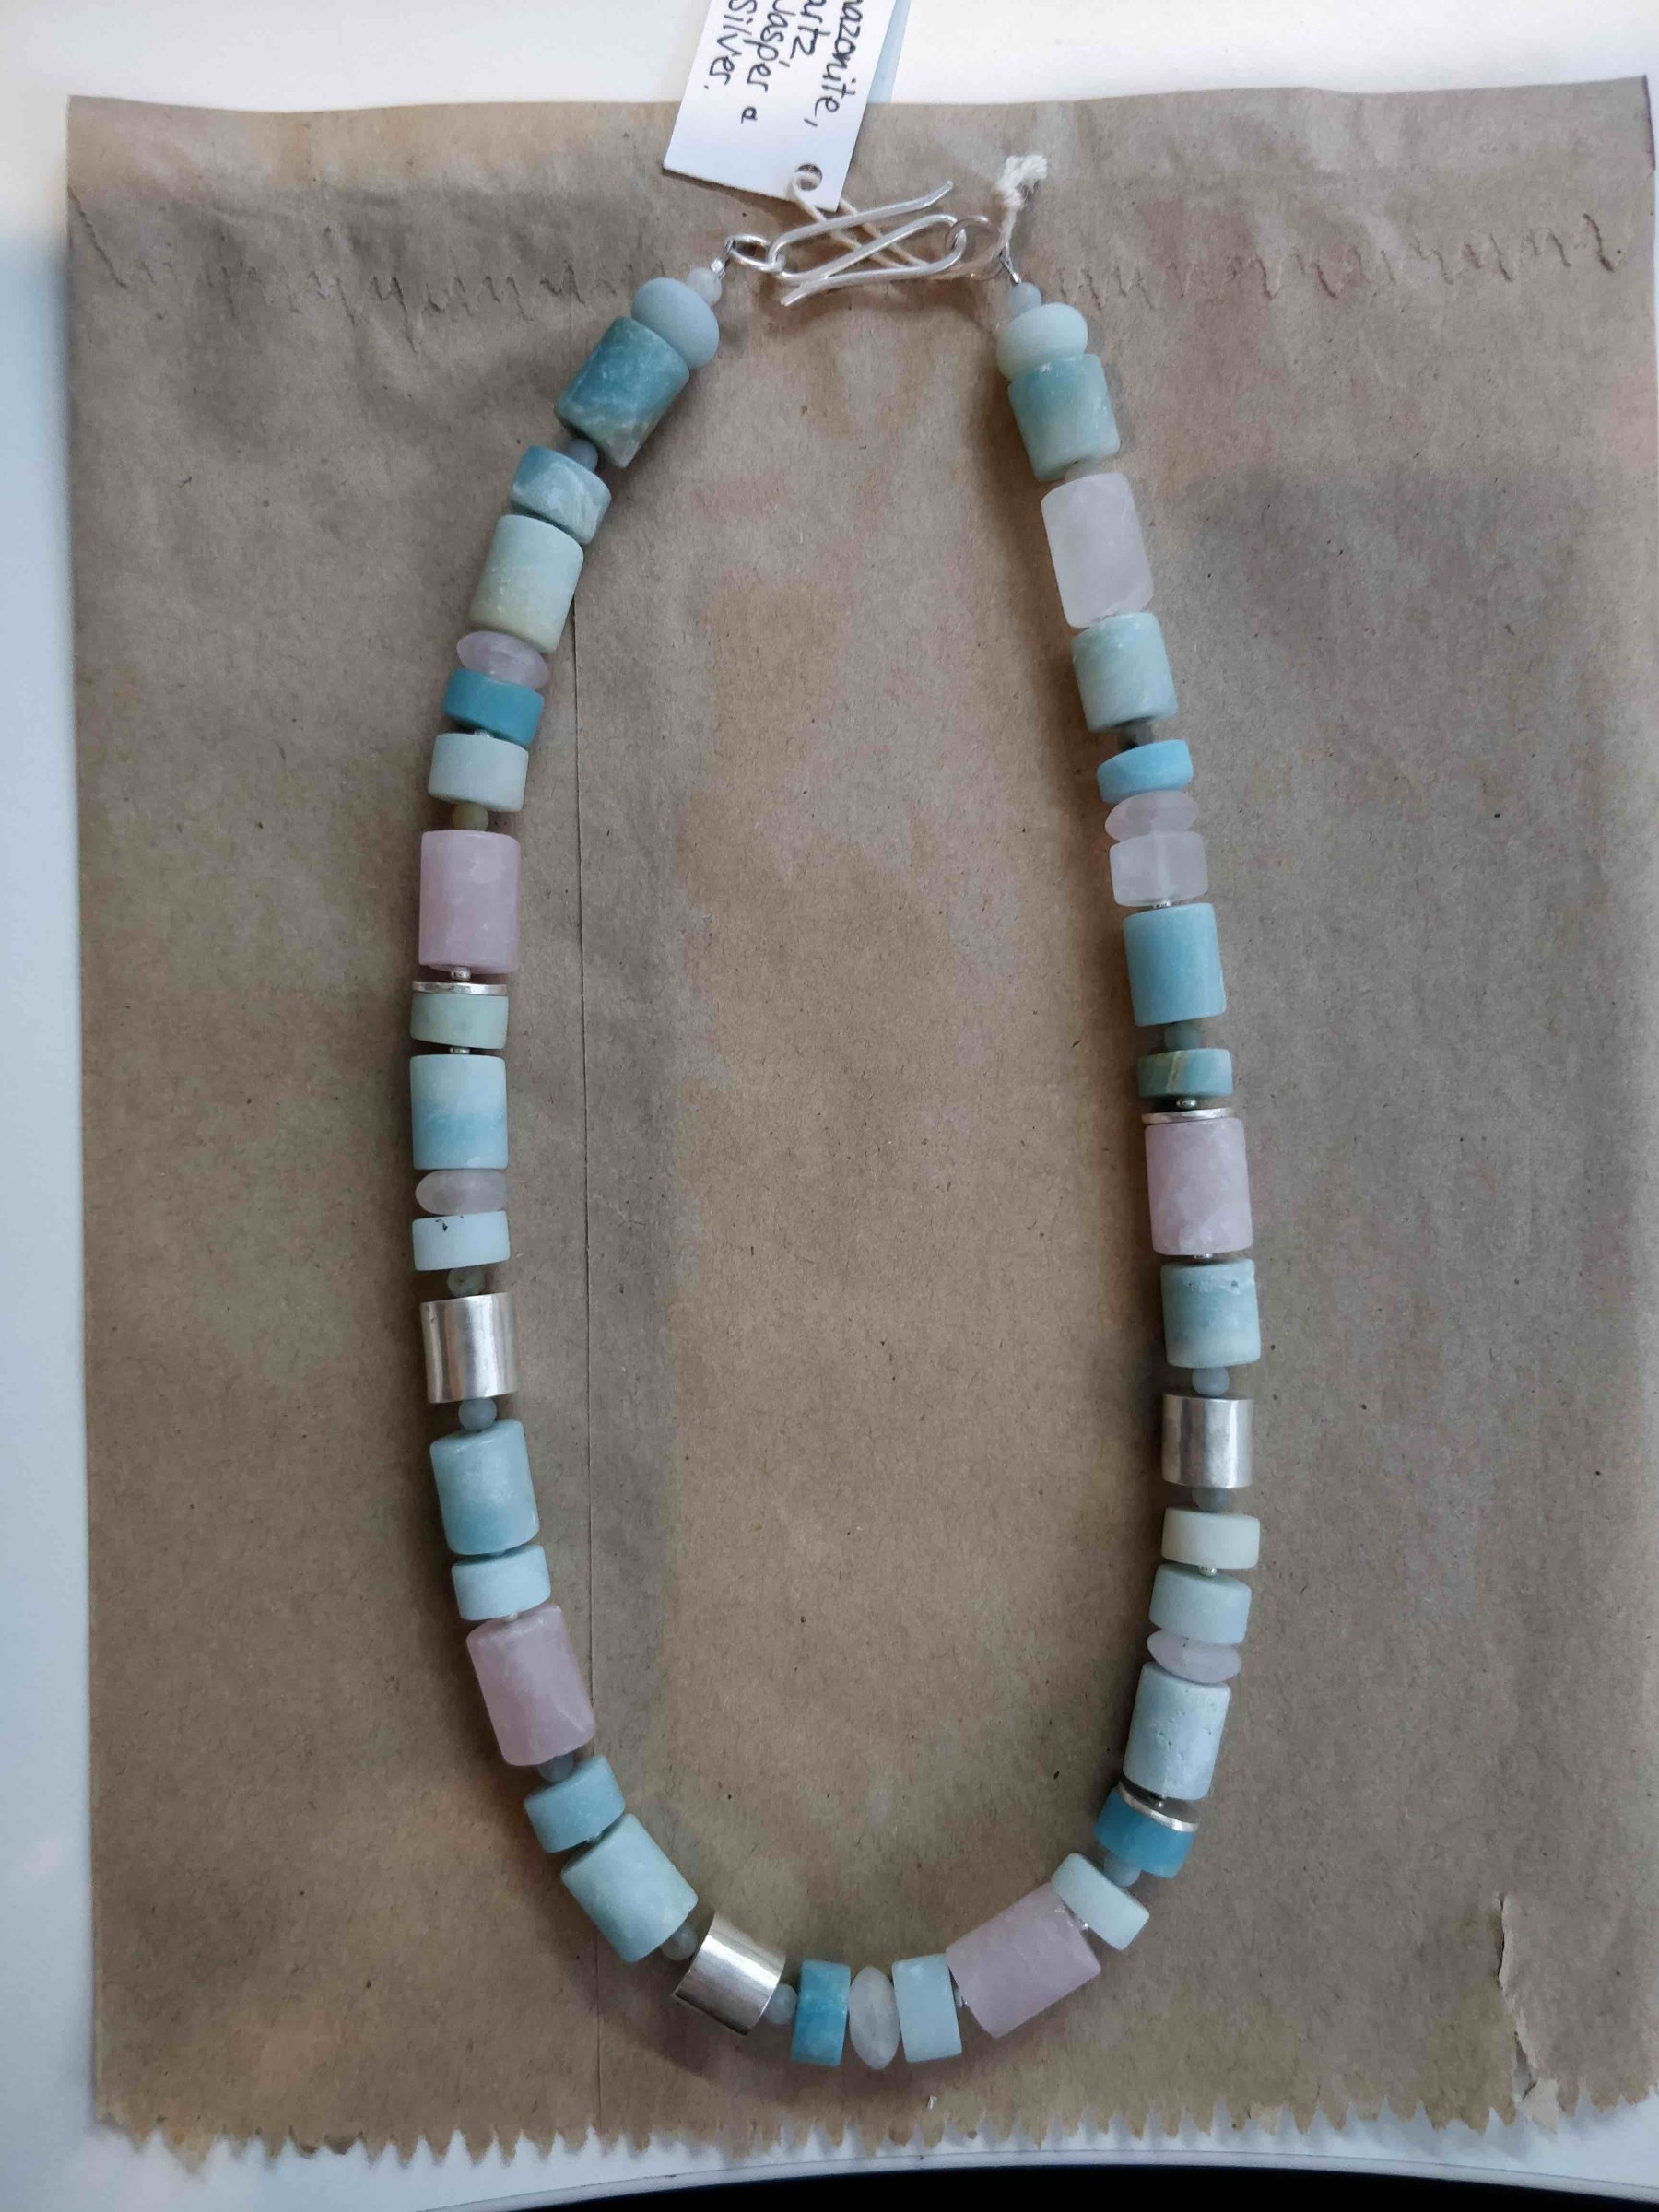 "<span class=""link fancybox-details-link""><a href=""/artists/148-roberta-hopkins/works/5701-roberta-hopkins-black-amazonite-rose-quartz-tubes-2018/"">View Detail Page</a></span><div class=""artist""><strong>Roberta Hopkins</strong></div> <div class=""title""><em>Black Amazonite/Rose Quartz tubes</em>, 2018</div> <div class=""medium"">sterling silver</div><div class=""price"">£190.00</div><div class=""copyright_line"">£ 19 x 10 Months, OwnArt 0% APR</div>"